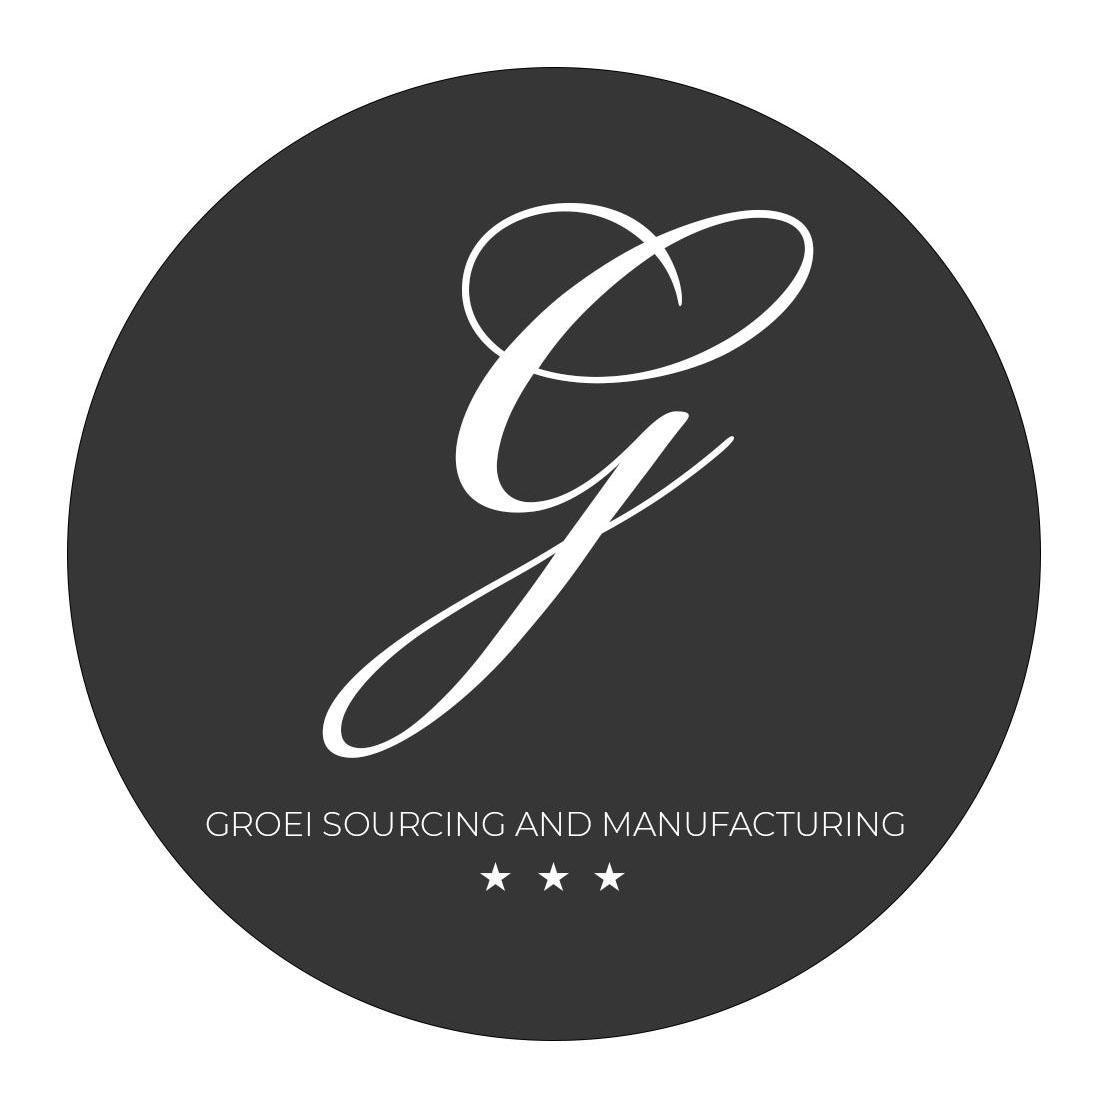 Groei Sourcing & Manfacturing